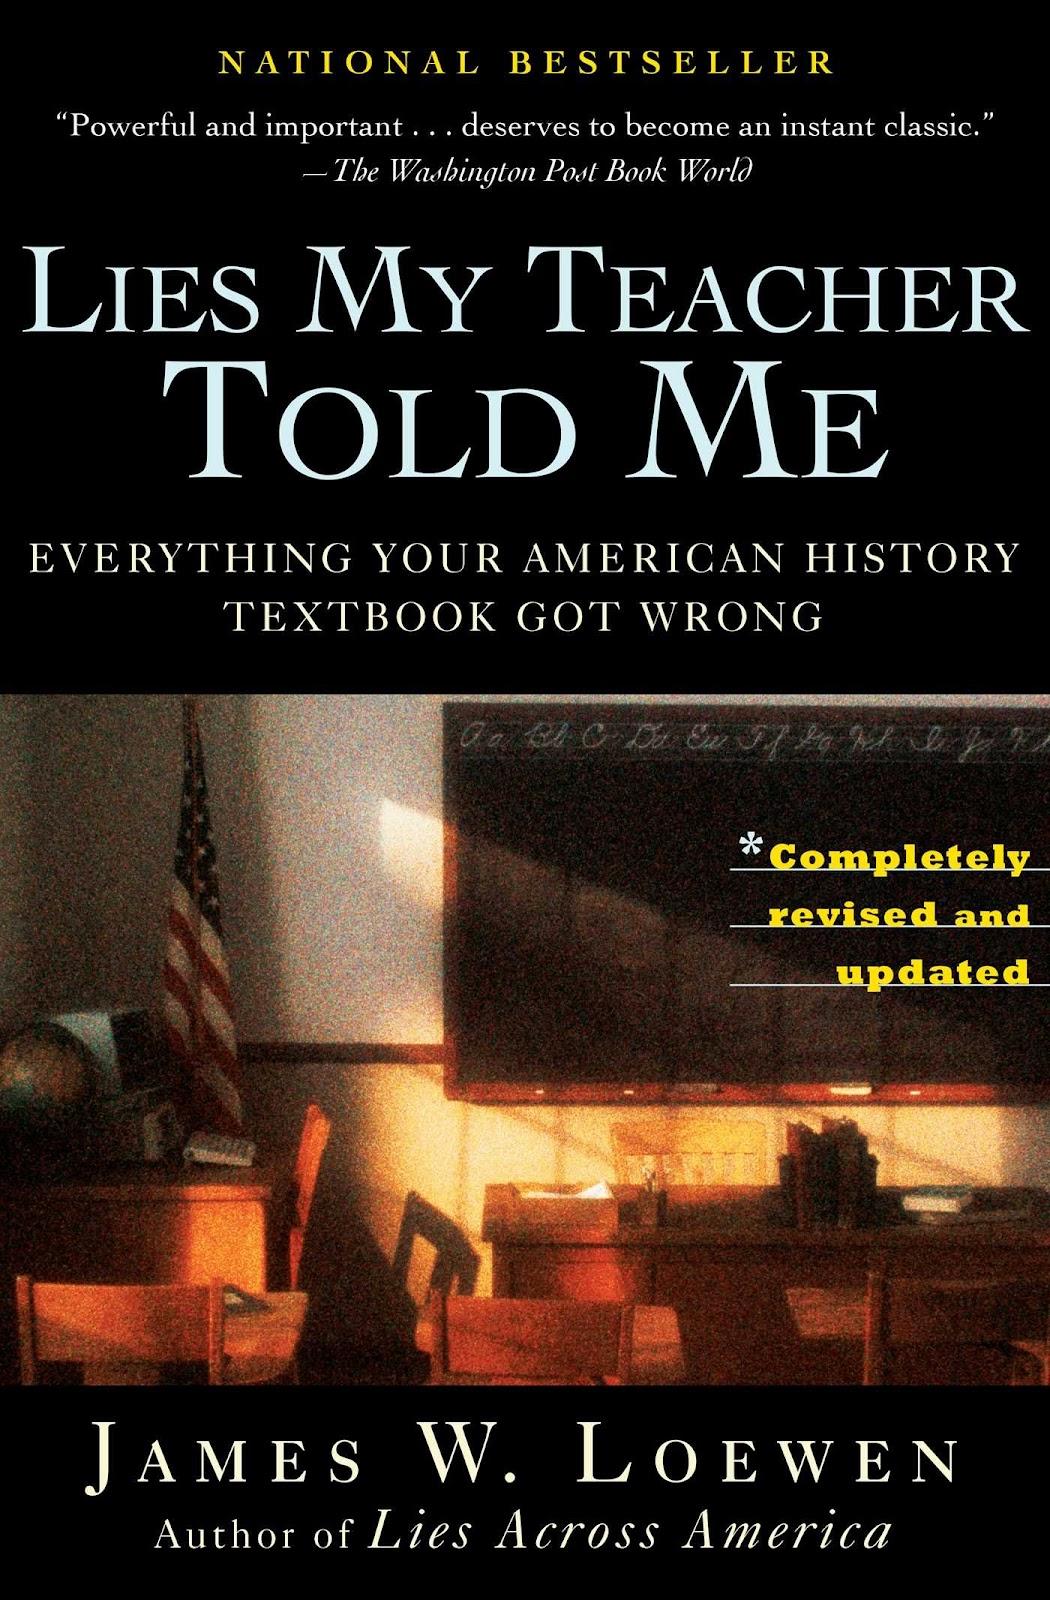 Lies My Teacher Told Me.jpg